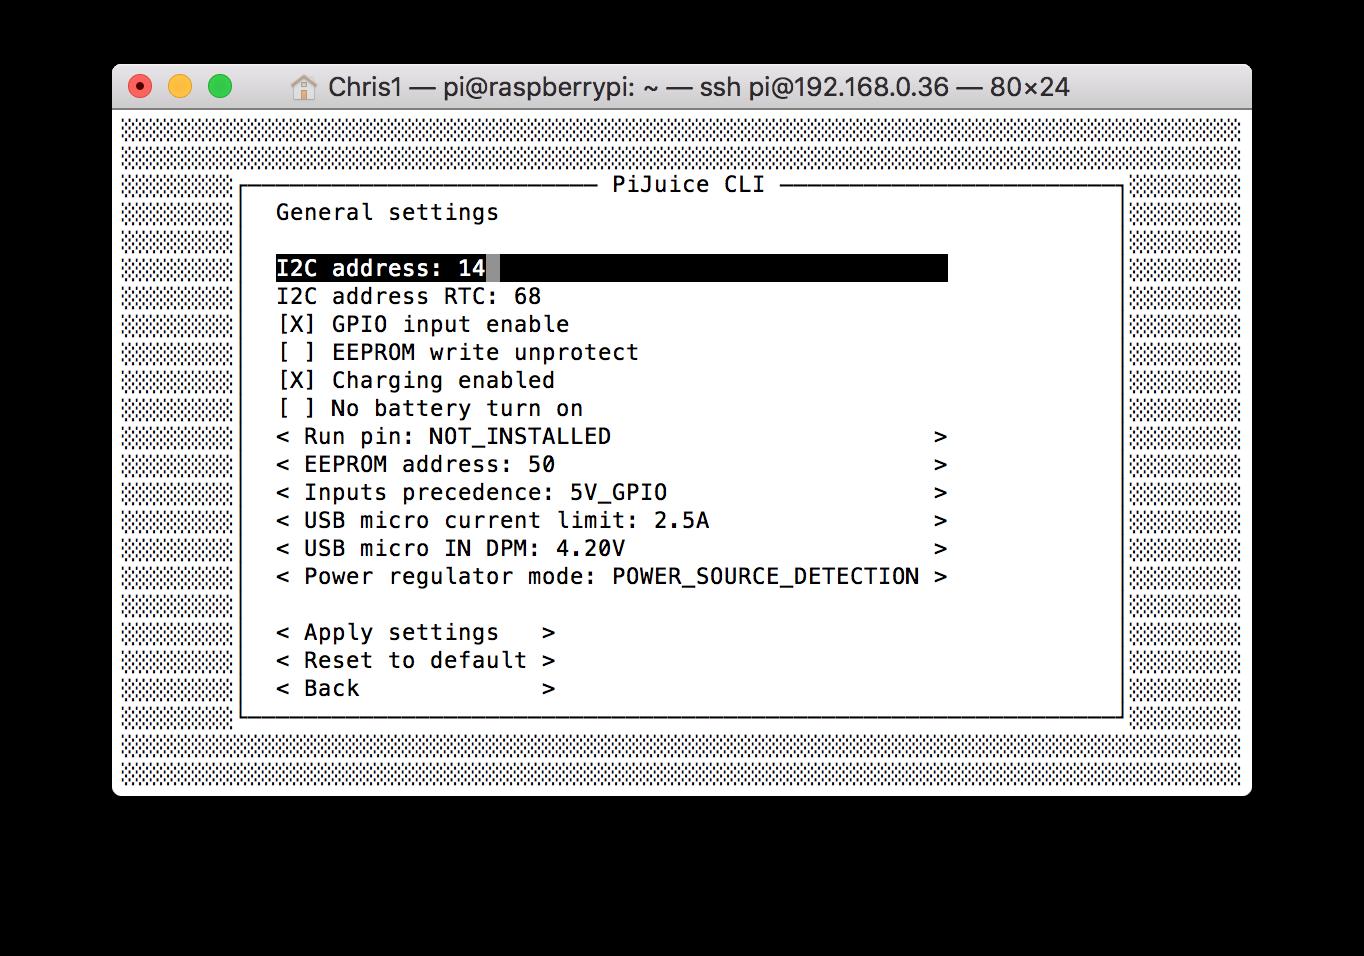 PiJuice/Software at master · PiSupply/PiJuice · GitHub